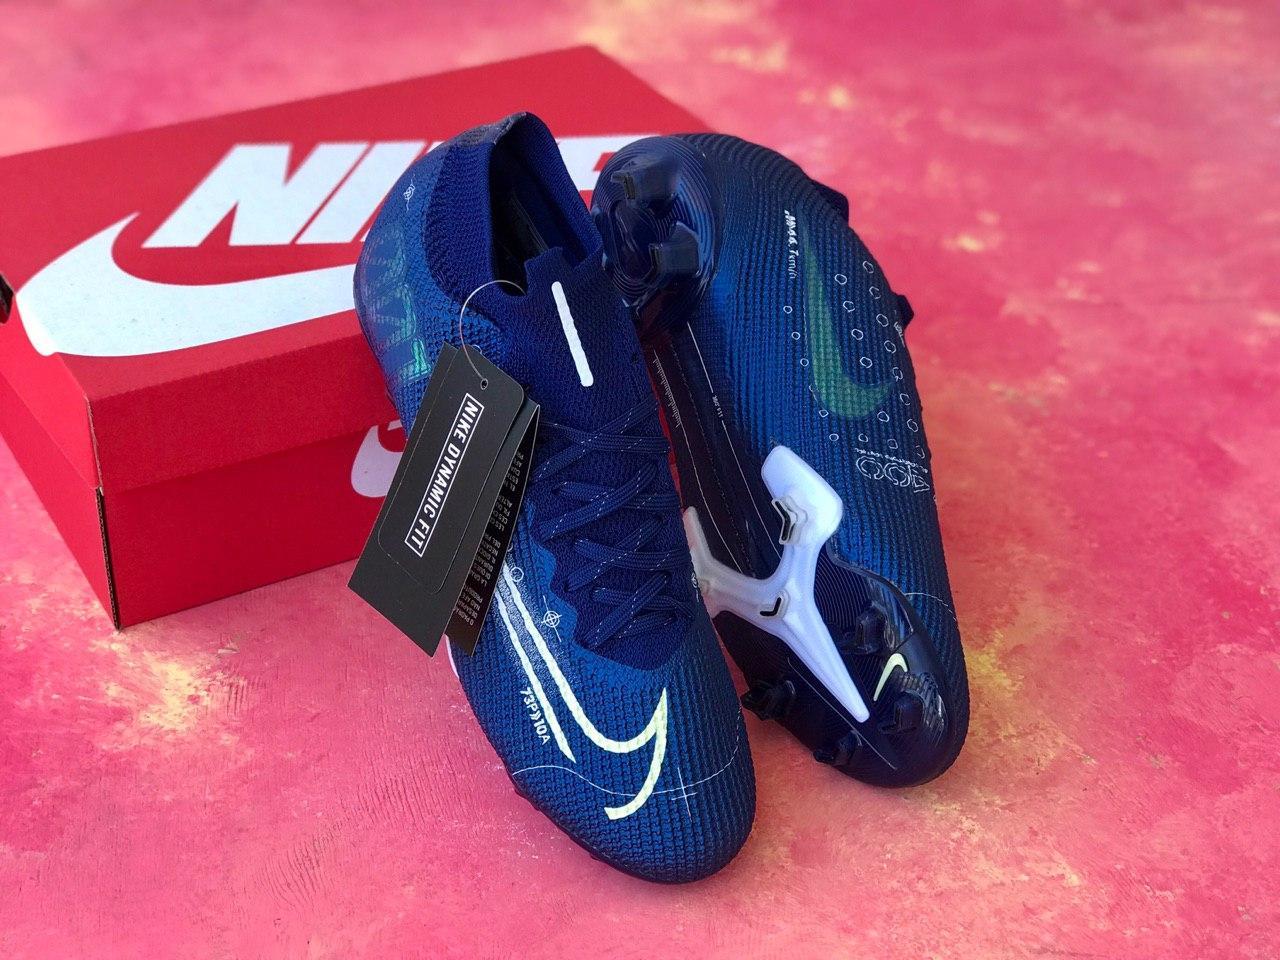 Бутсы Nike Mercurial Vapor XIII Pro FG/найк меркуриал вапор/ копы